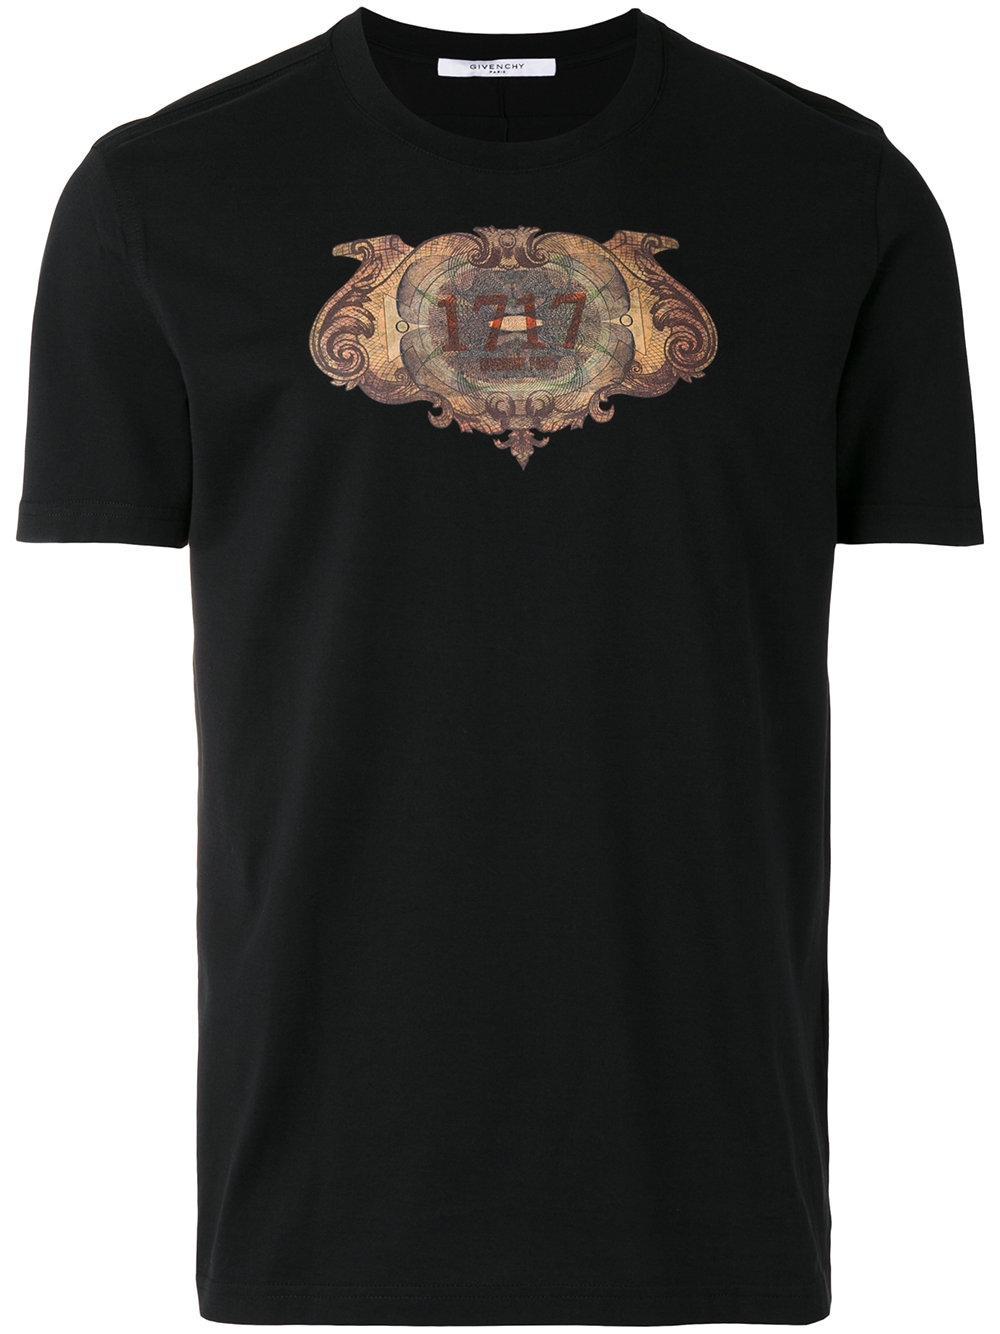 lyst givenchy printed t shirt in black for men. Black Bedroom Furniture Sets. Home Design Ideas